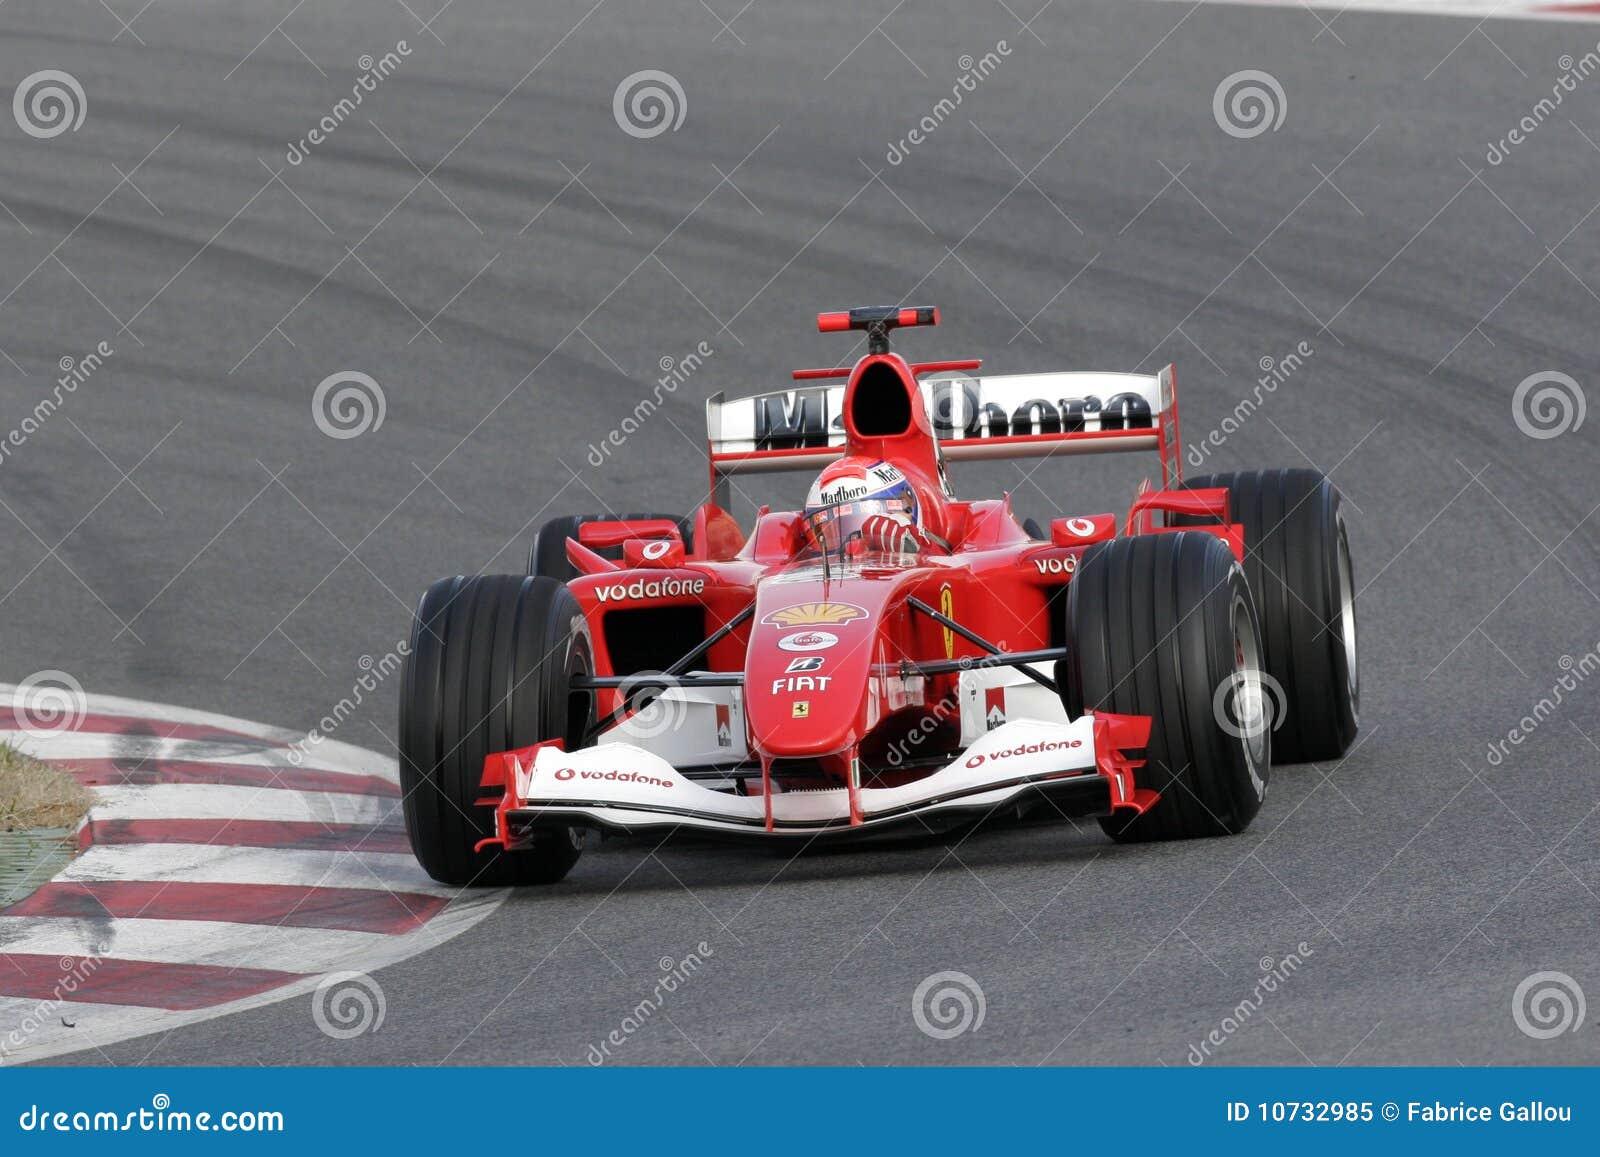 F1 2006 - Marc-Gen Ferrari